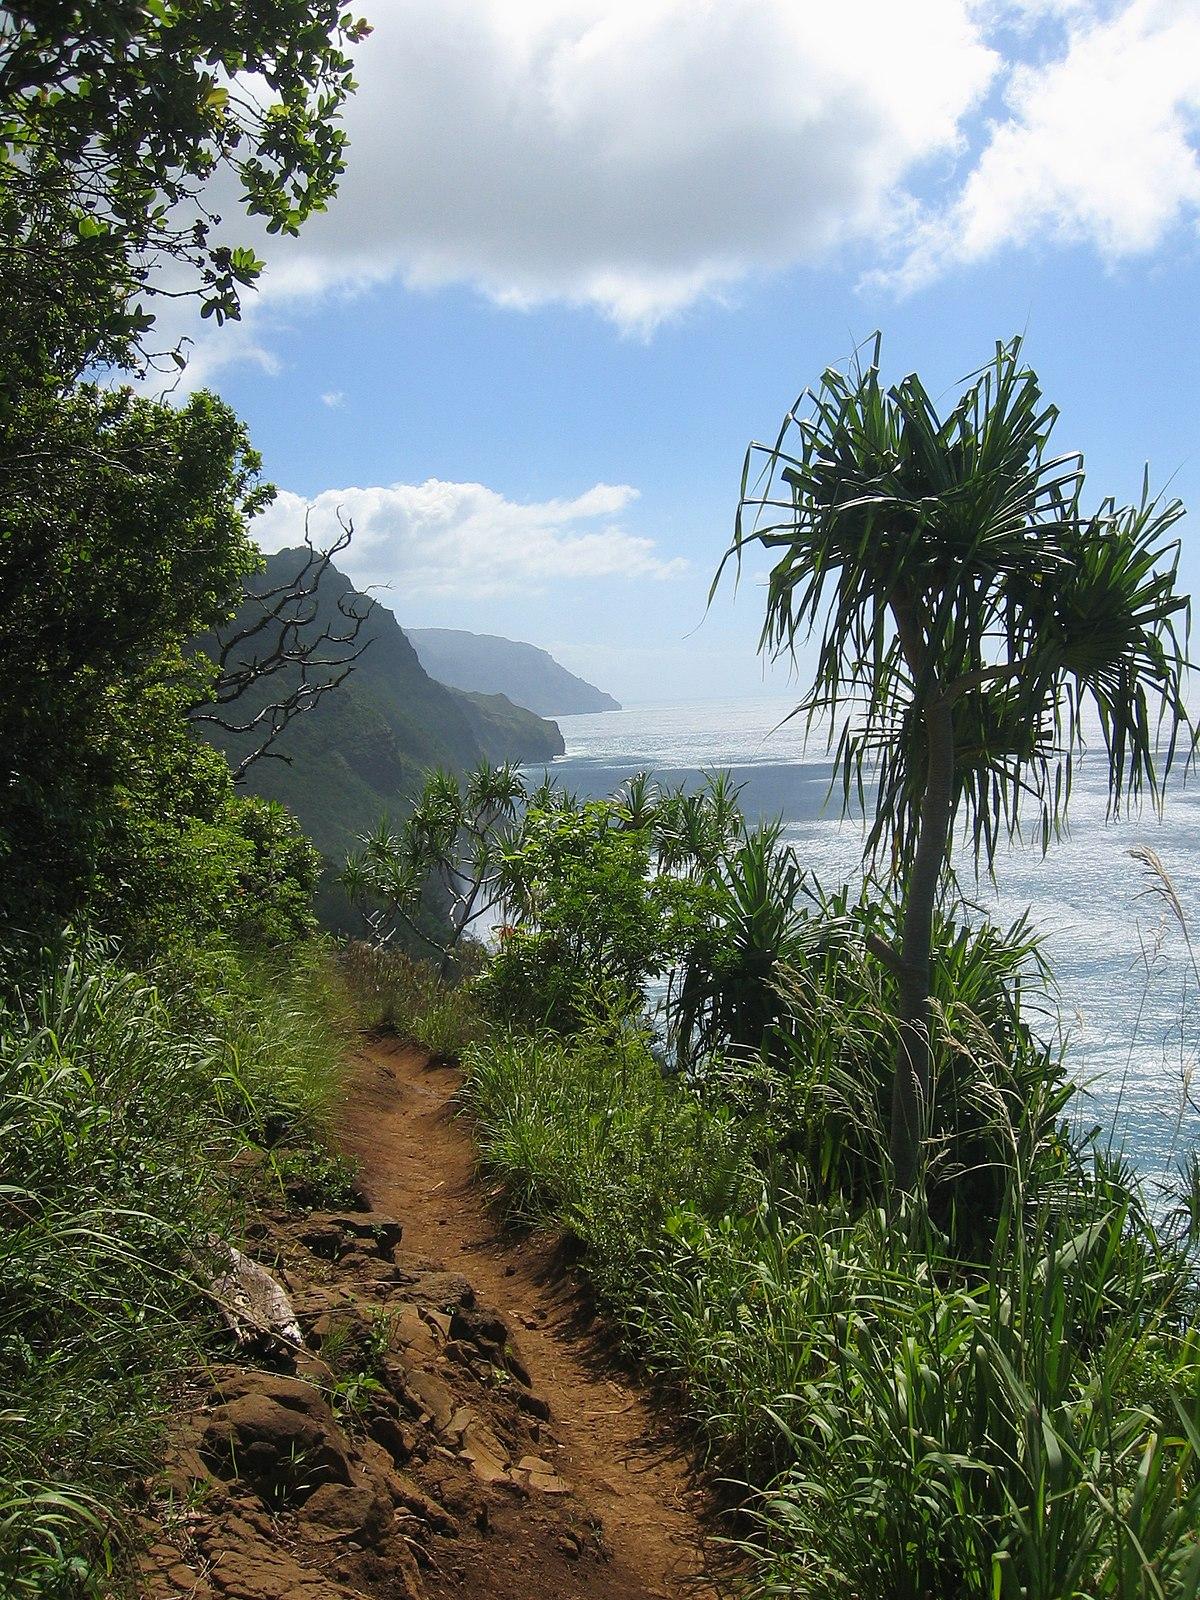 Hiking Kauai With Little Kids